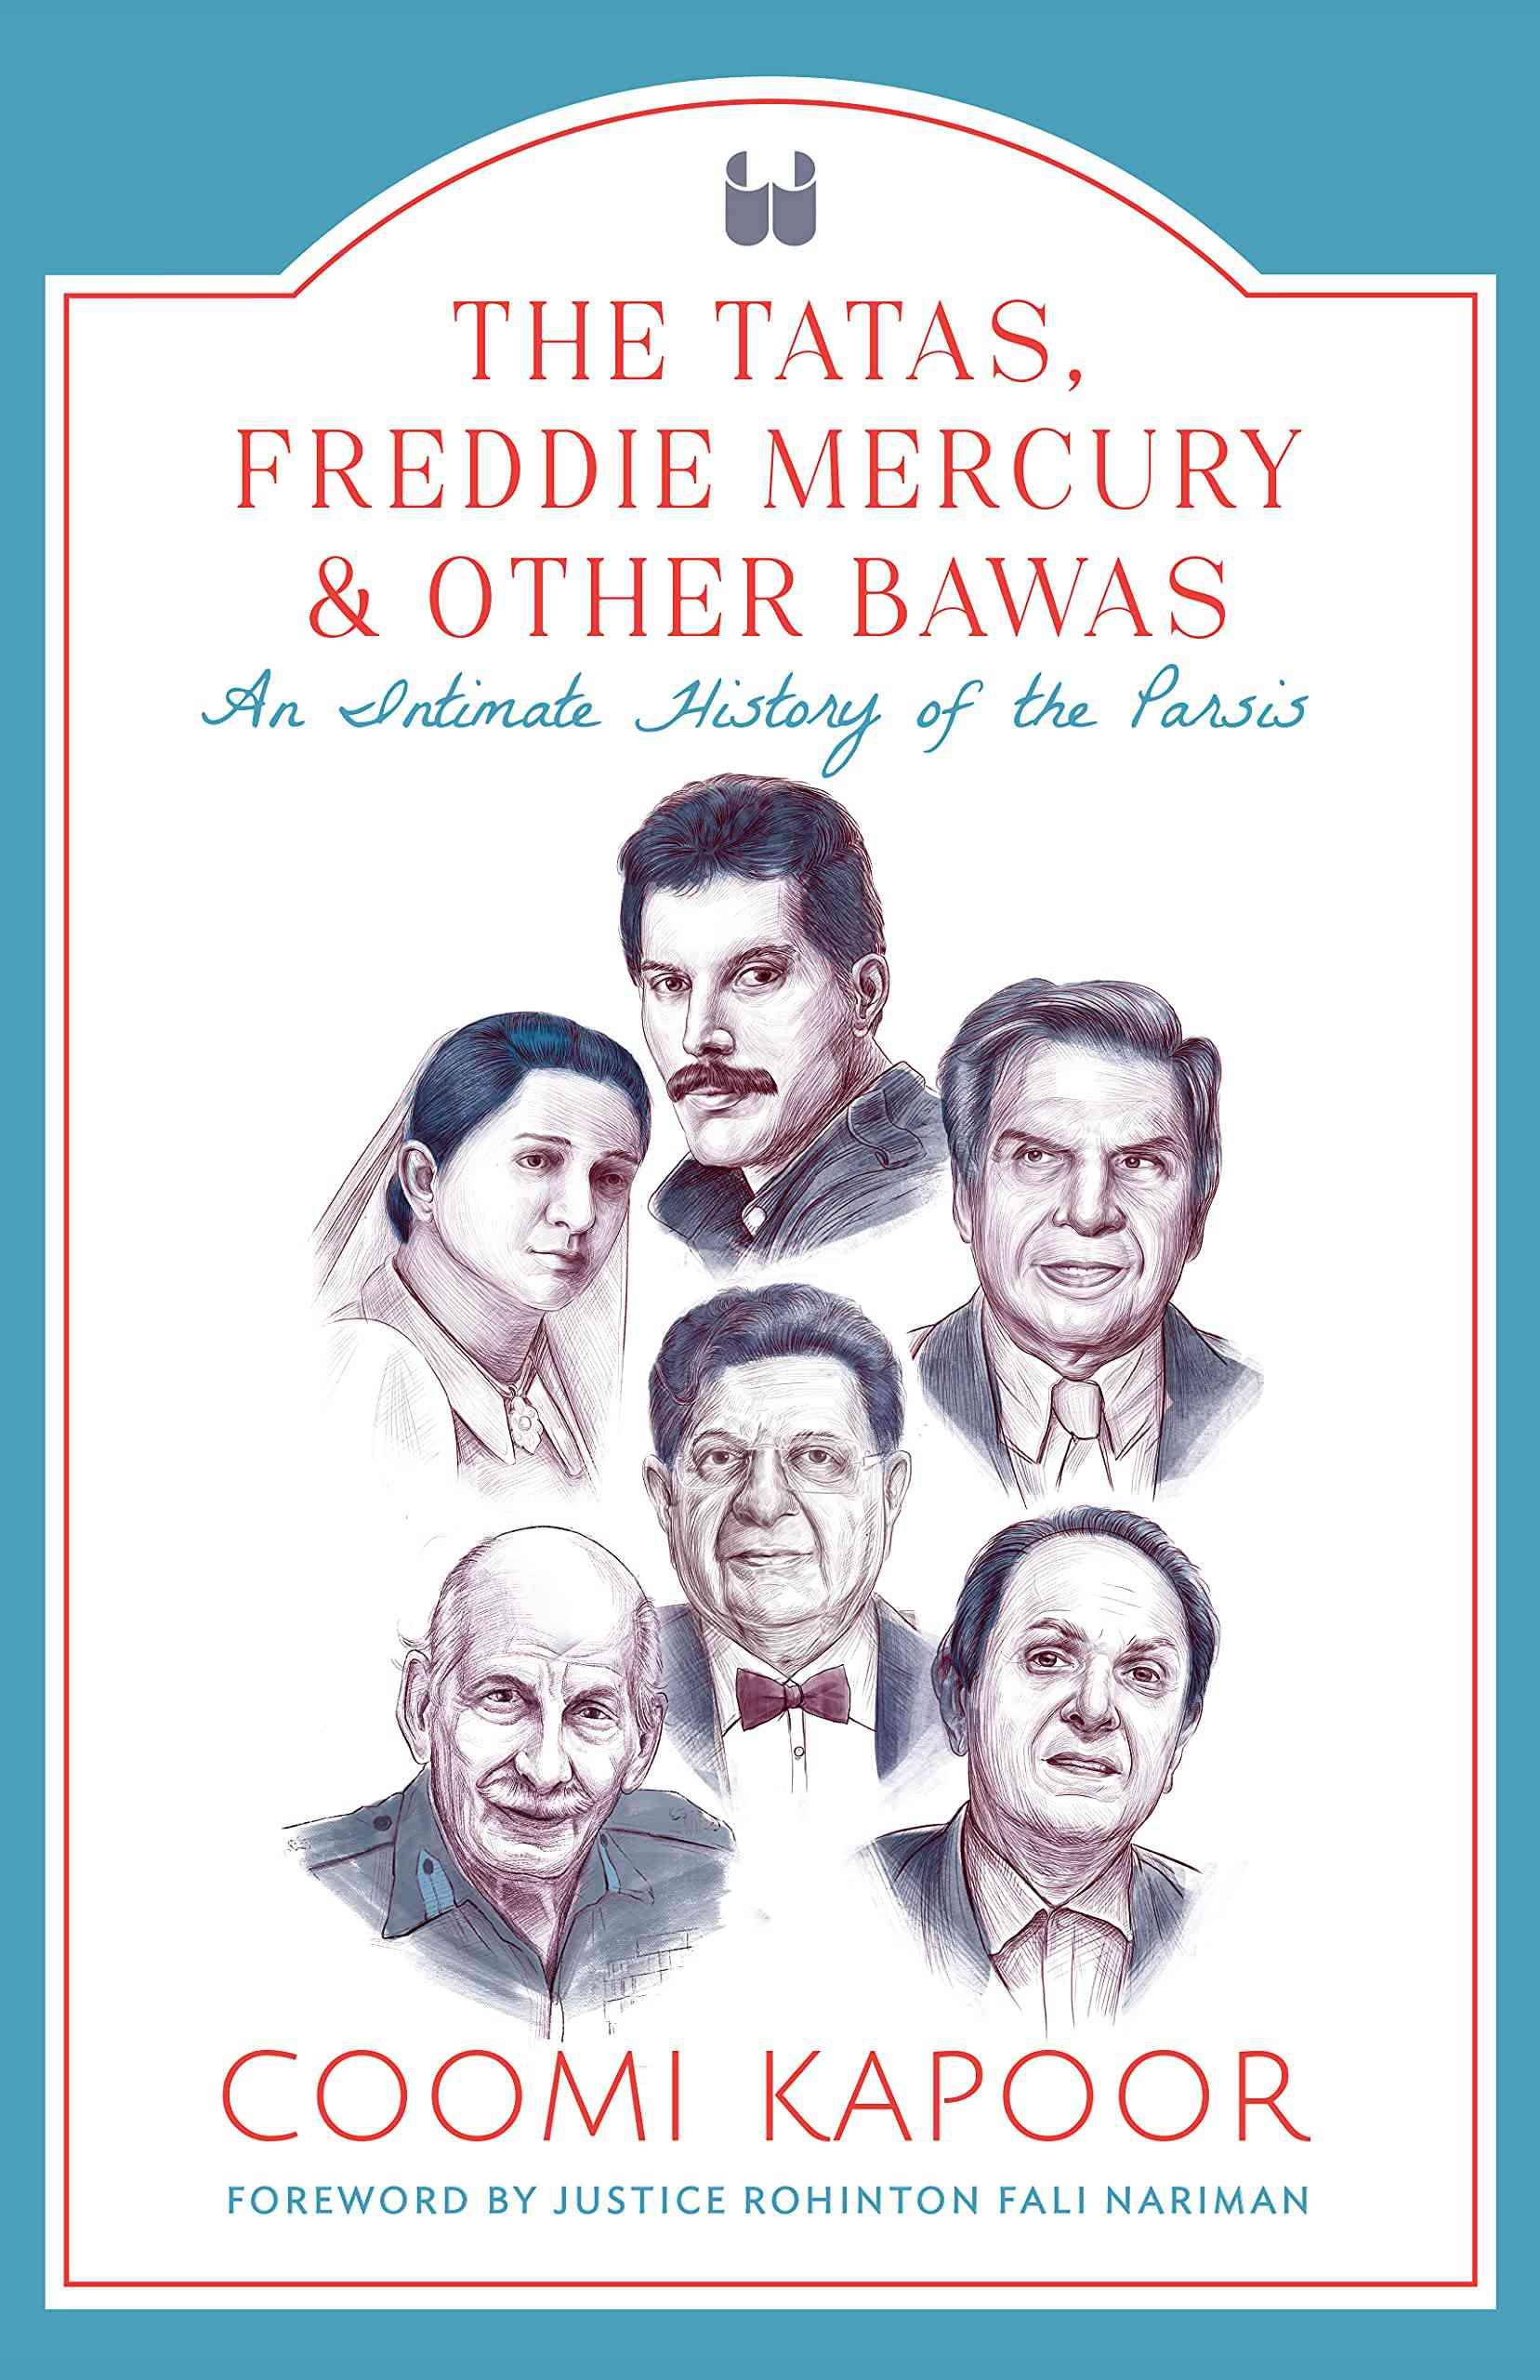 The Tatas, Freddie Mercury & Other Bawas